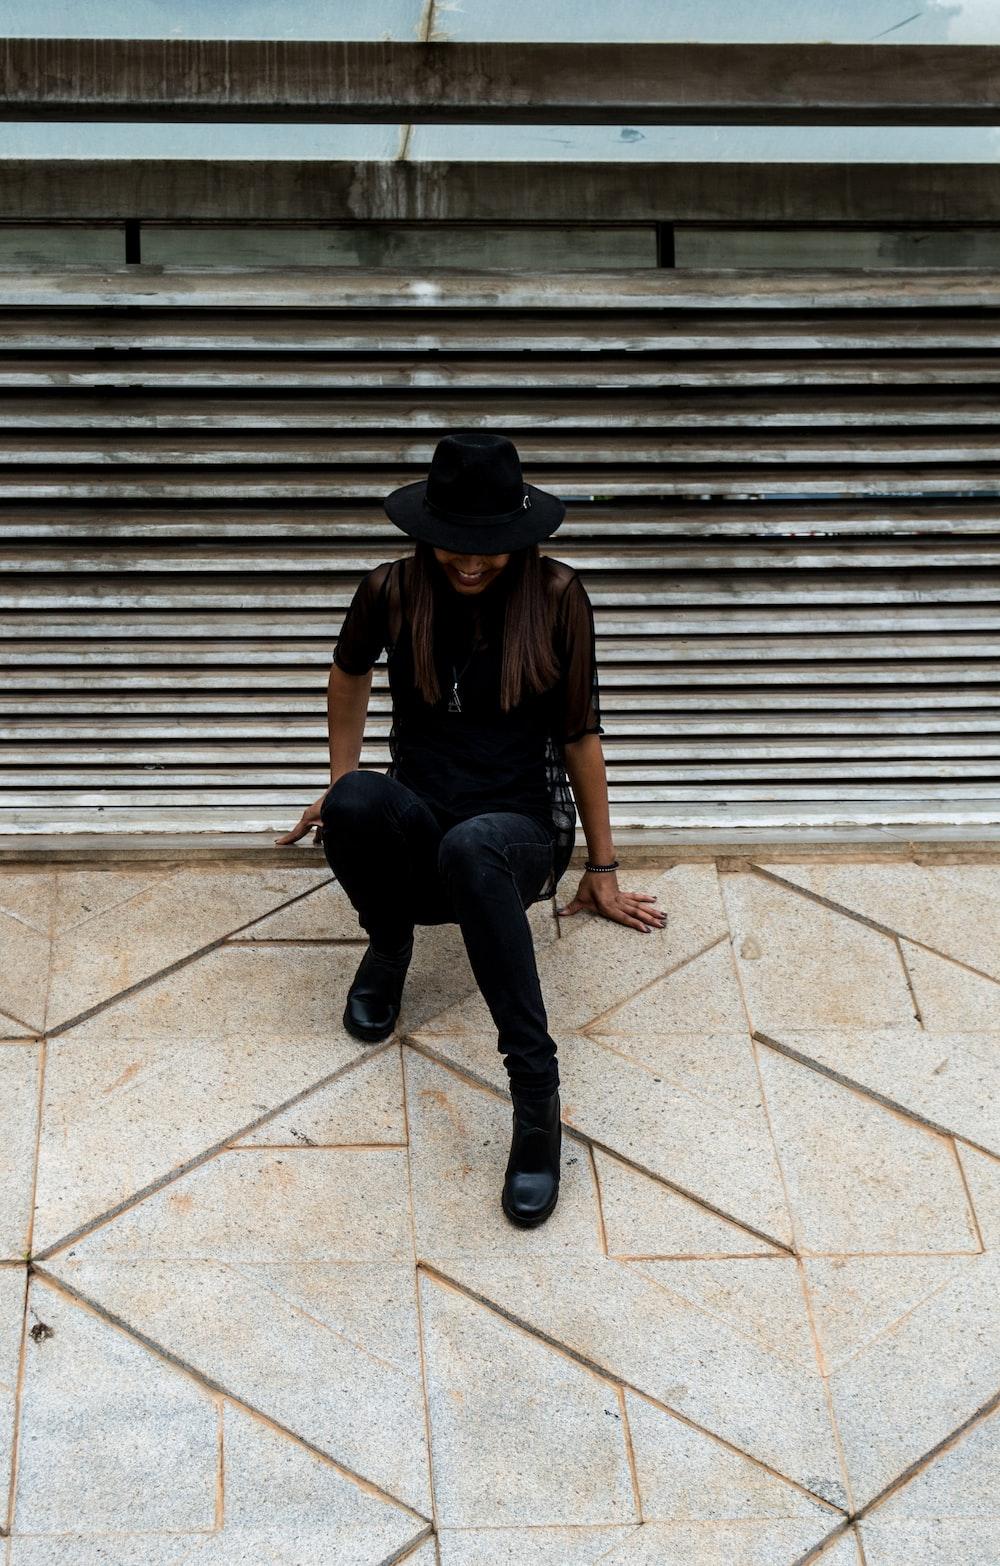 woman in black shirt sitting on gray concrete